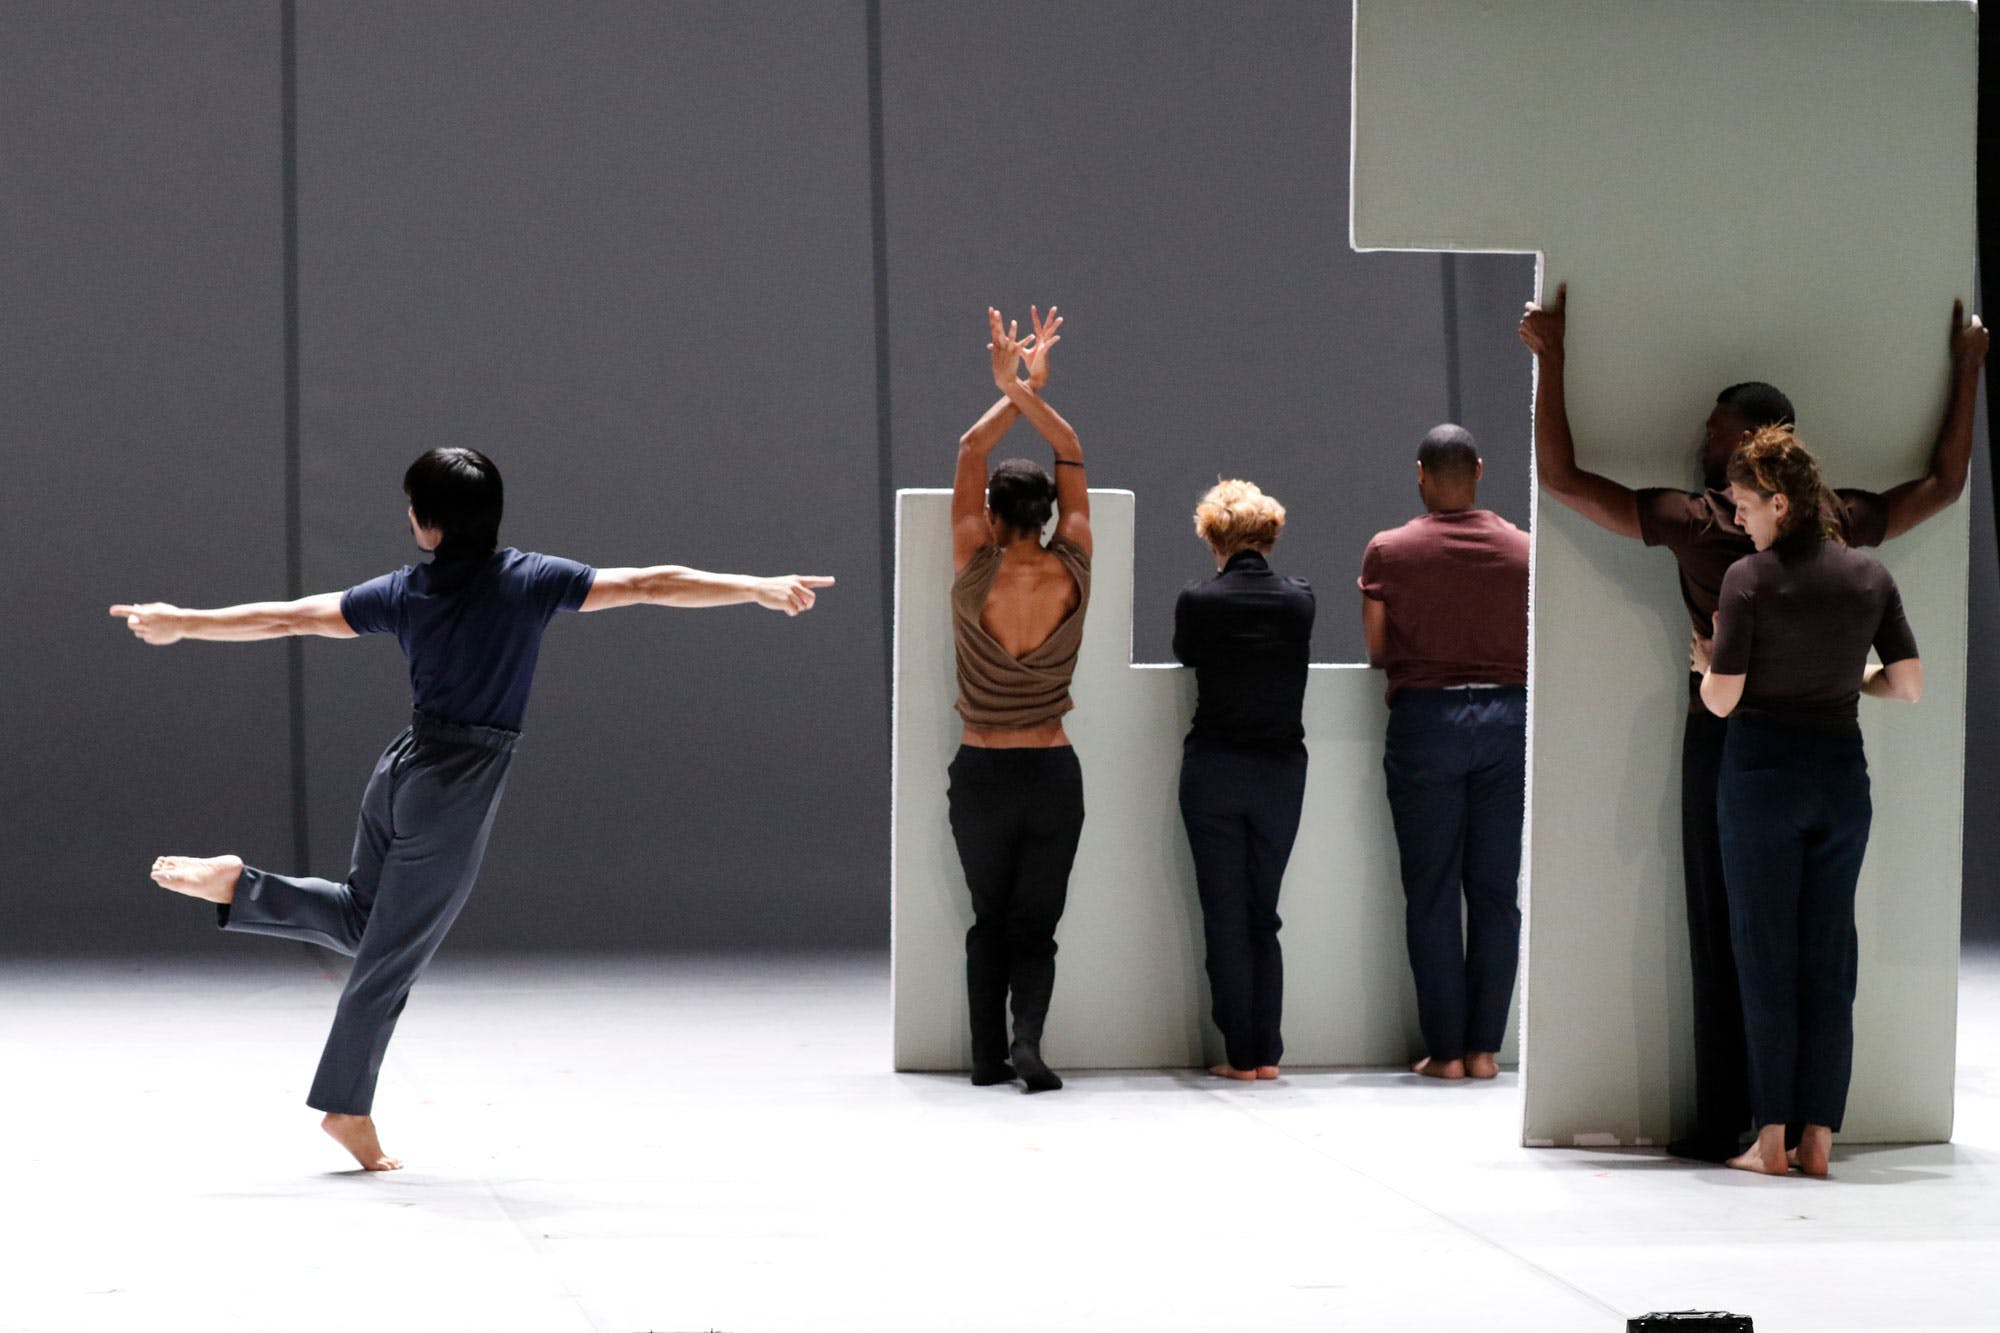 Bill T Jones/Arnie Zane Company, Analogy Trilogy: The Emigrant, 2019. Performance view. Photo by Paul B Goode